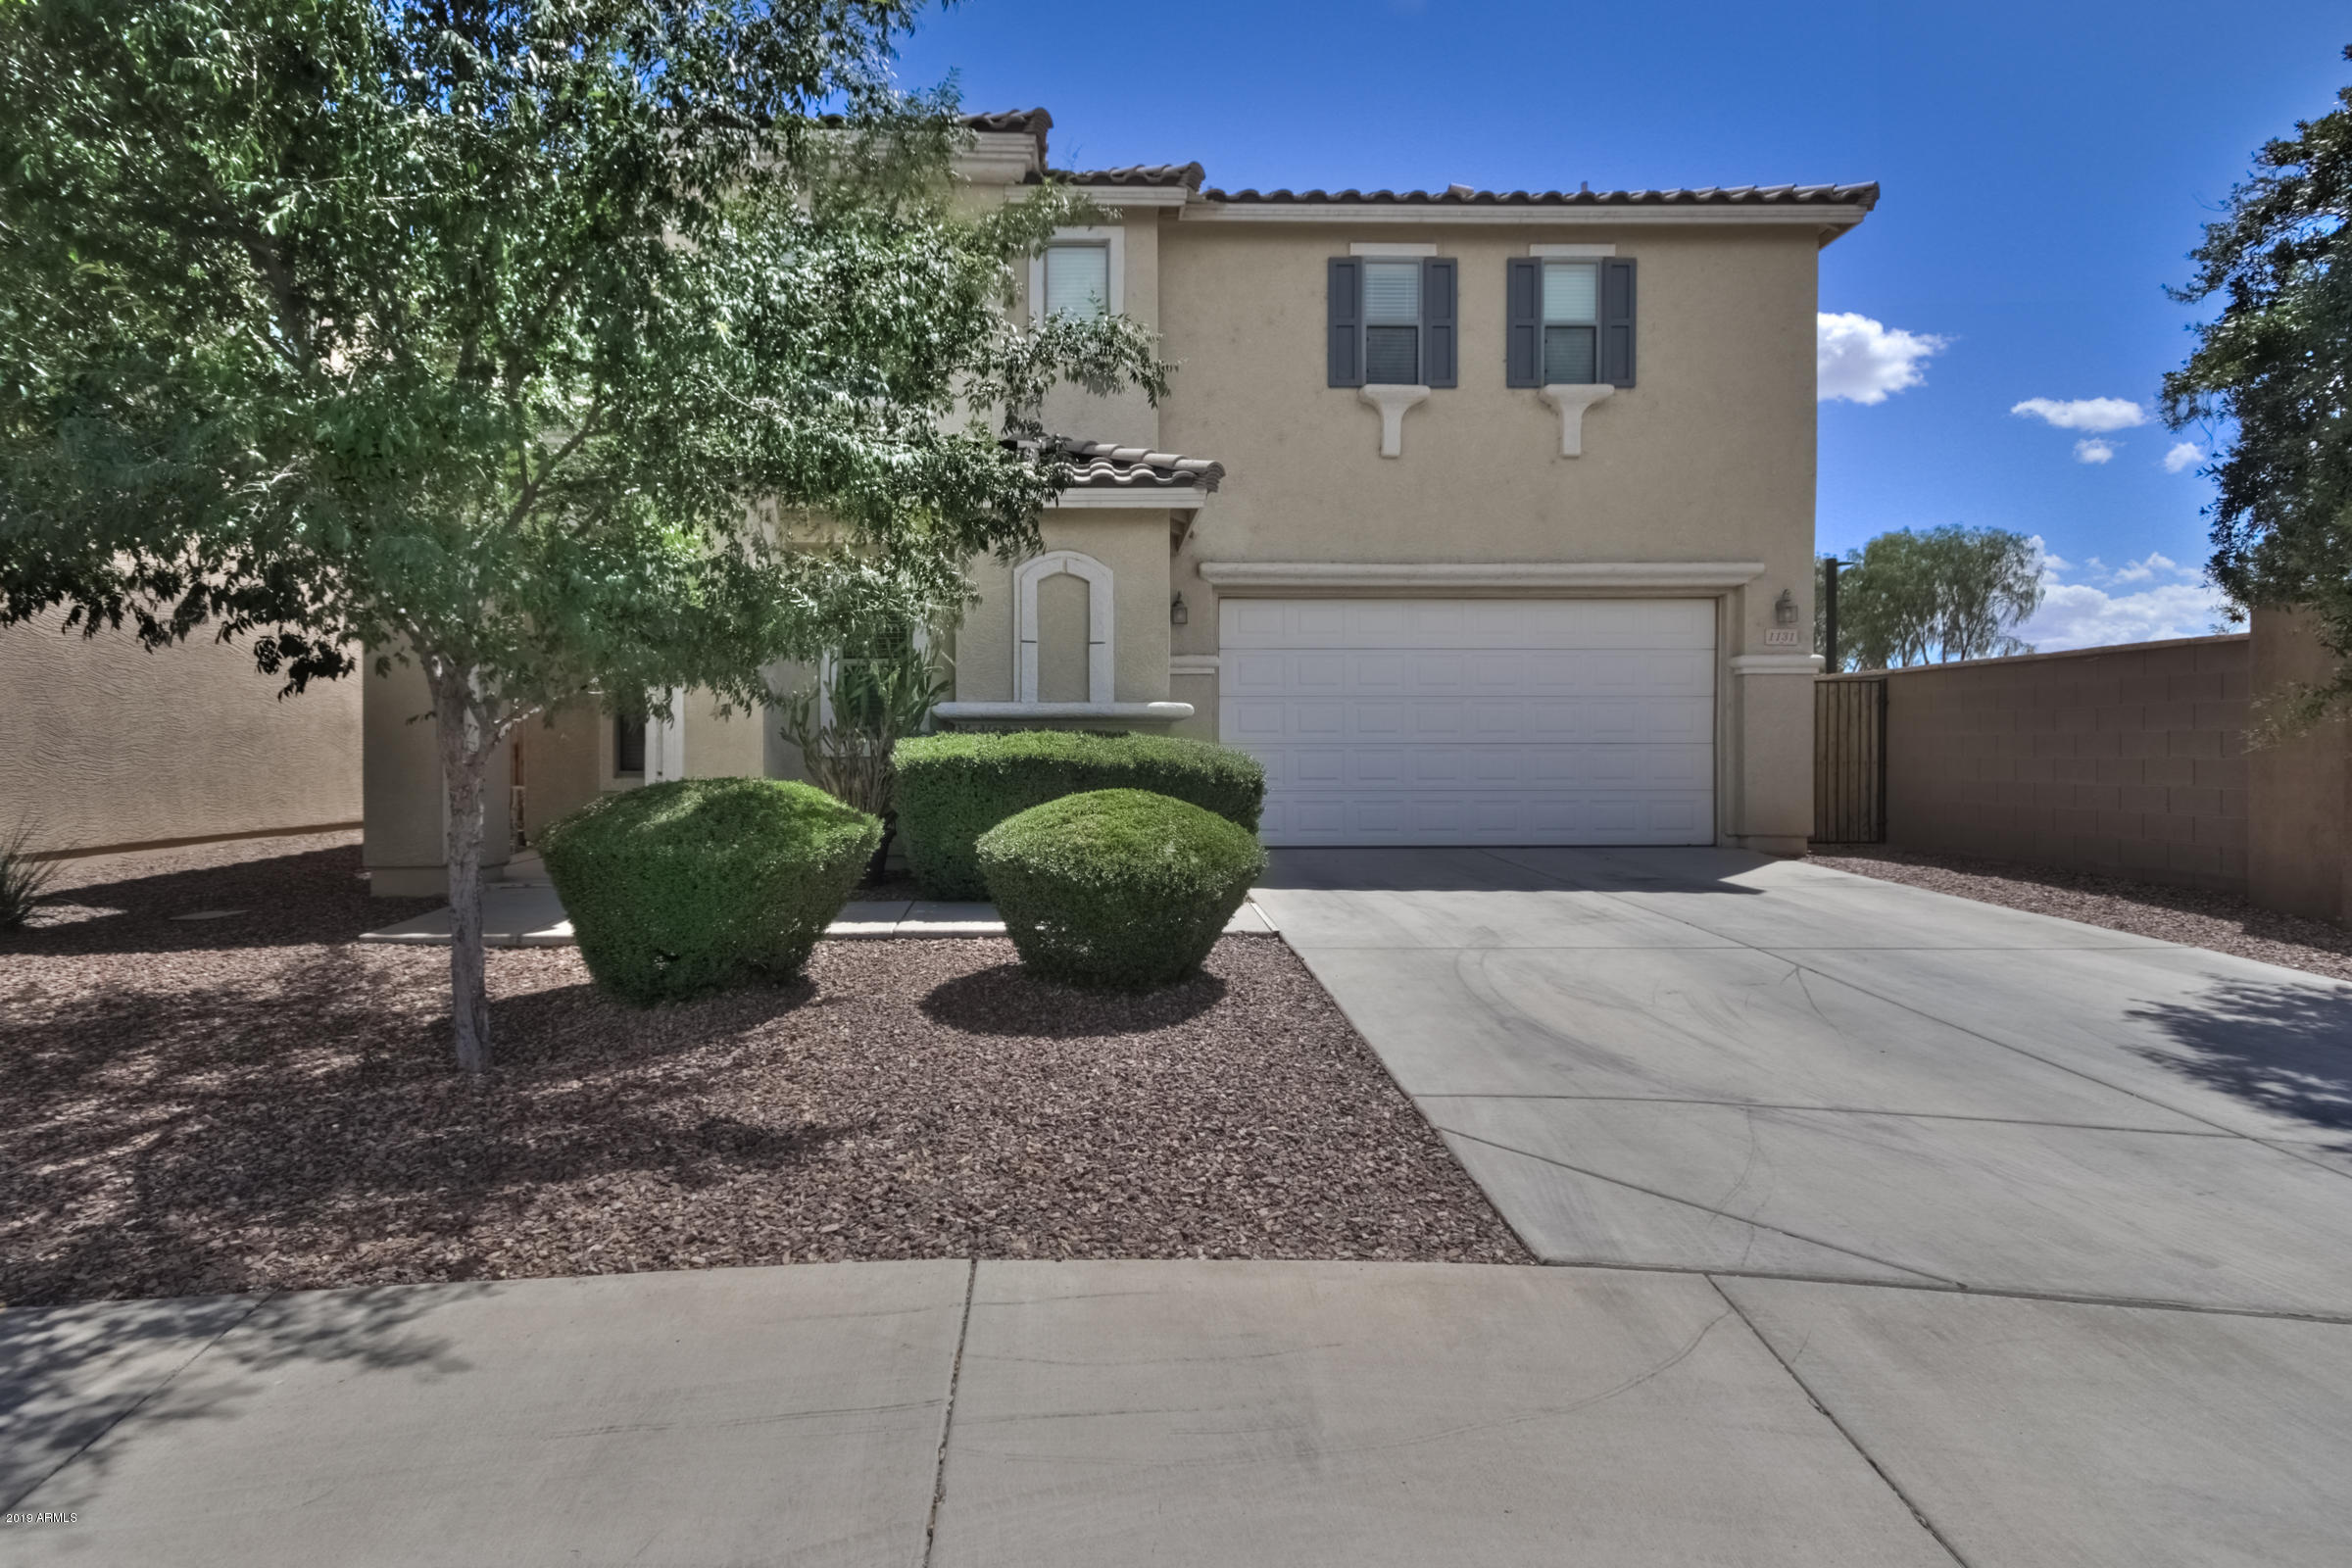 Photo of 1131 E VERMONT Drive, Gilbert, AZ 85295